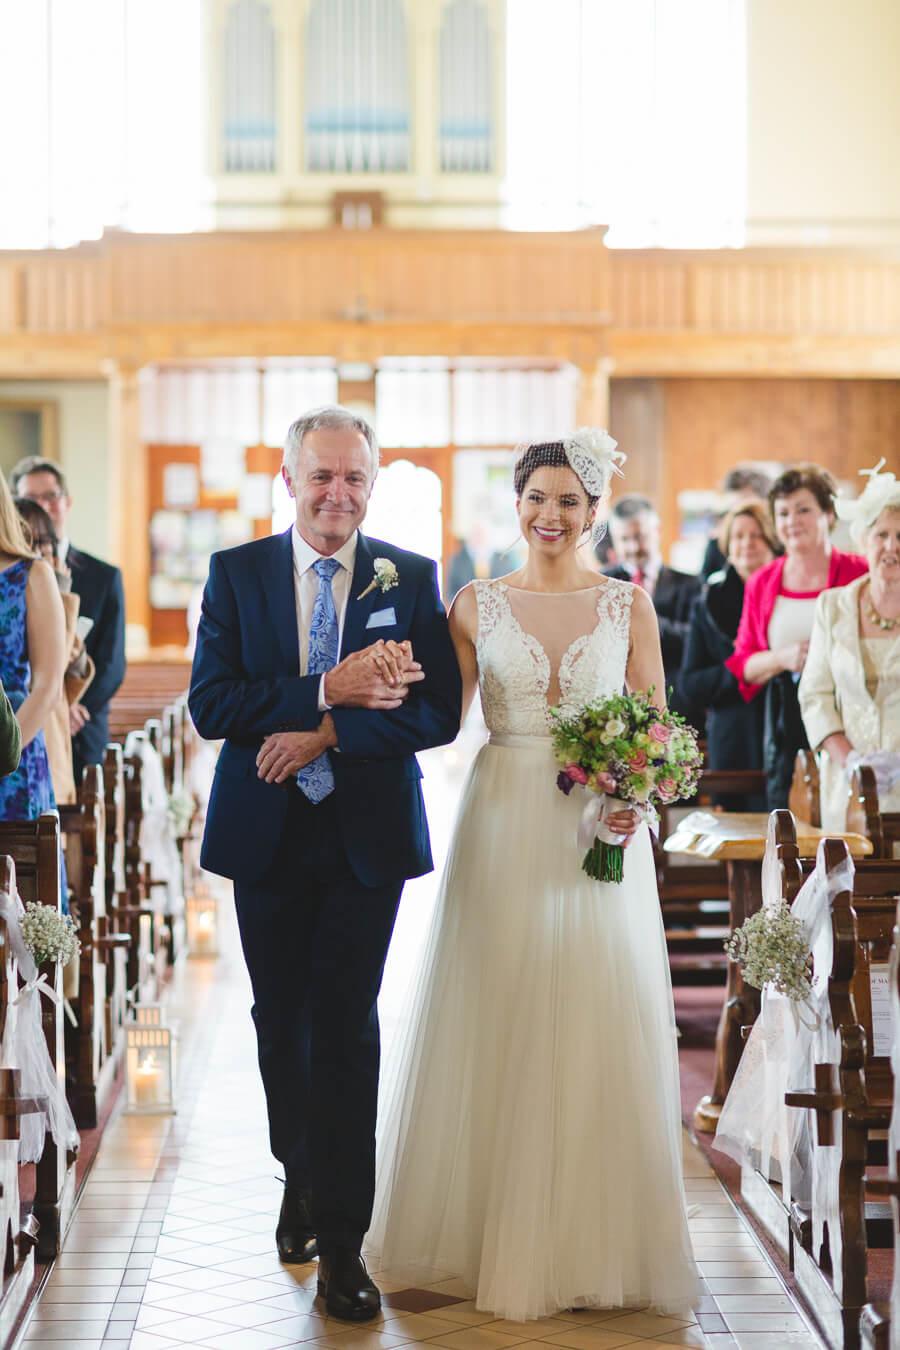 Foodie-Wedding-Step-House-Hotel-by -Annie-Kheffache-25